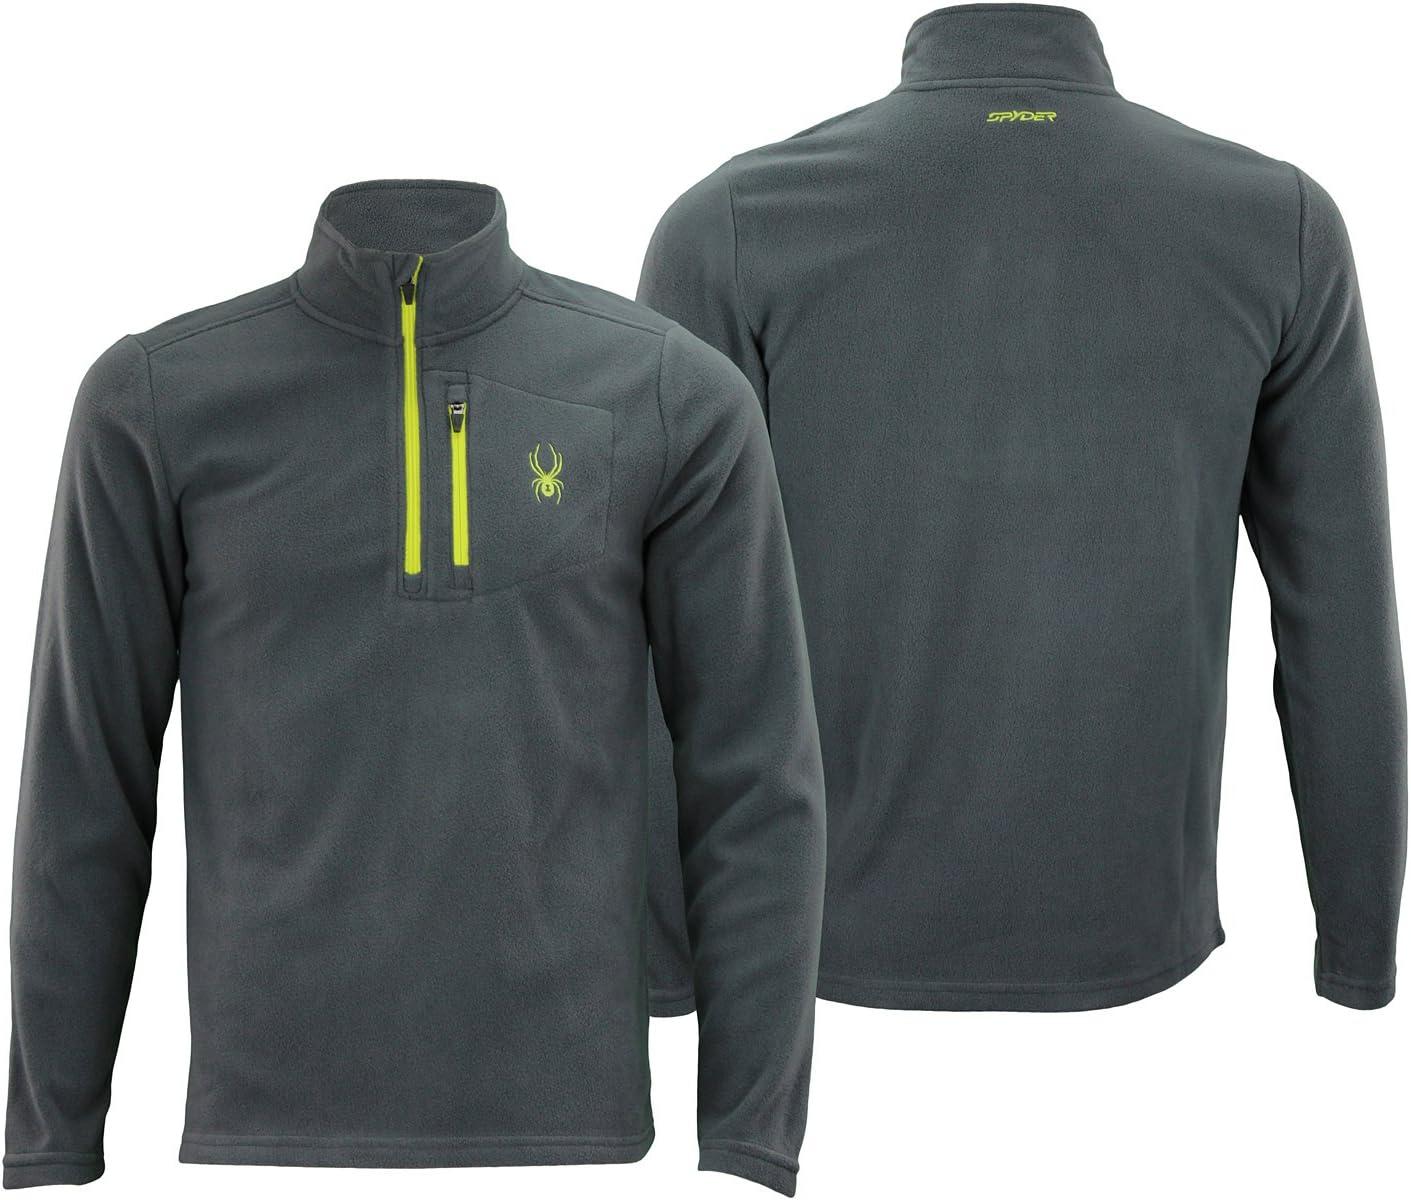 Spyder Kids Outbound Stryke Jacket Sweatshirt Sweater 8 Boys Size S NWT